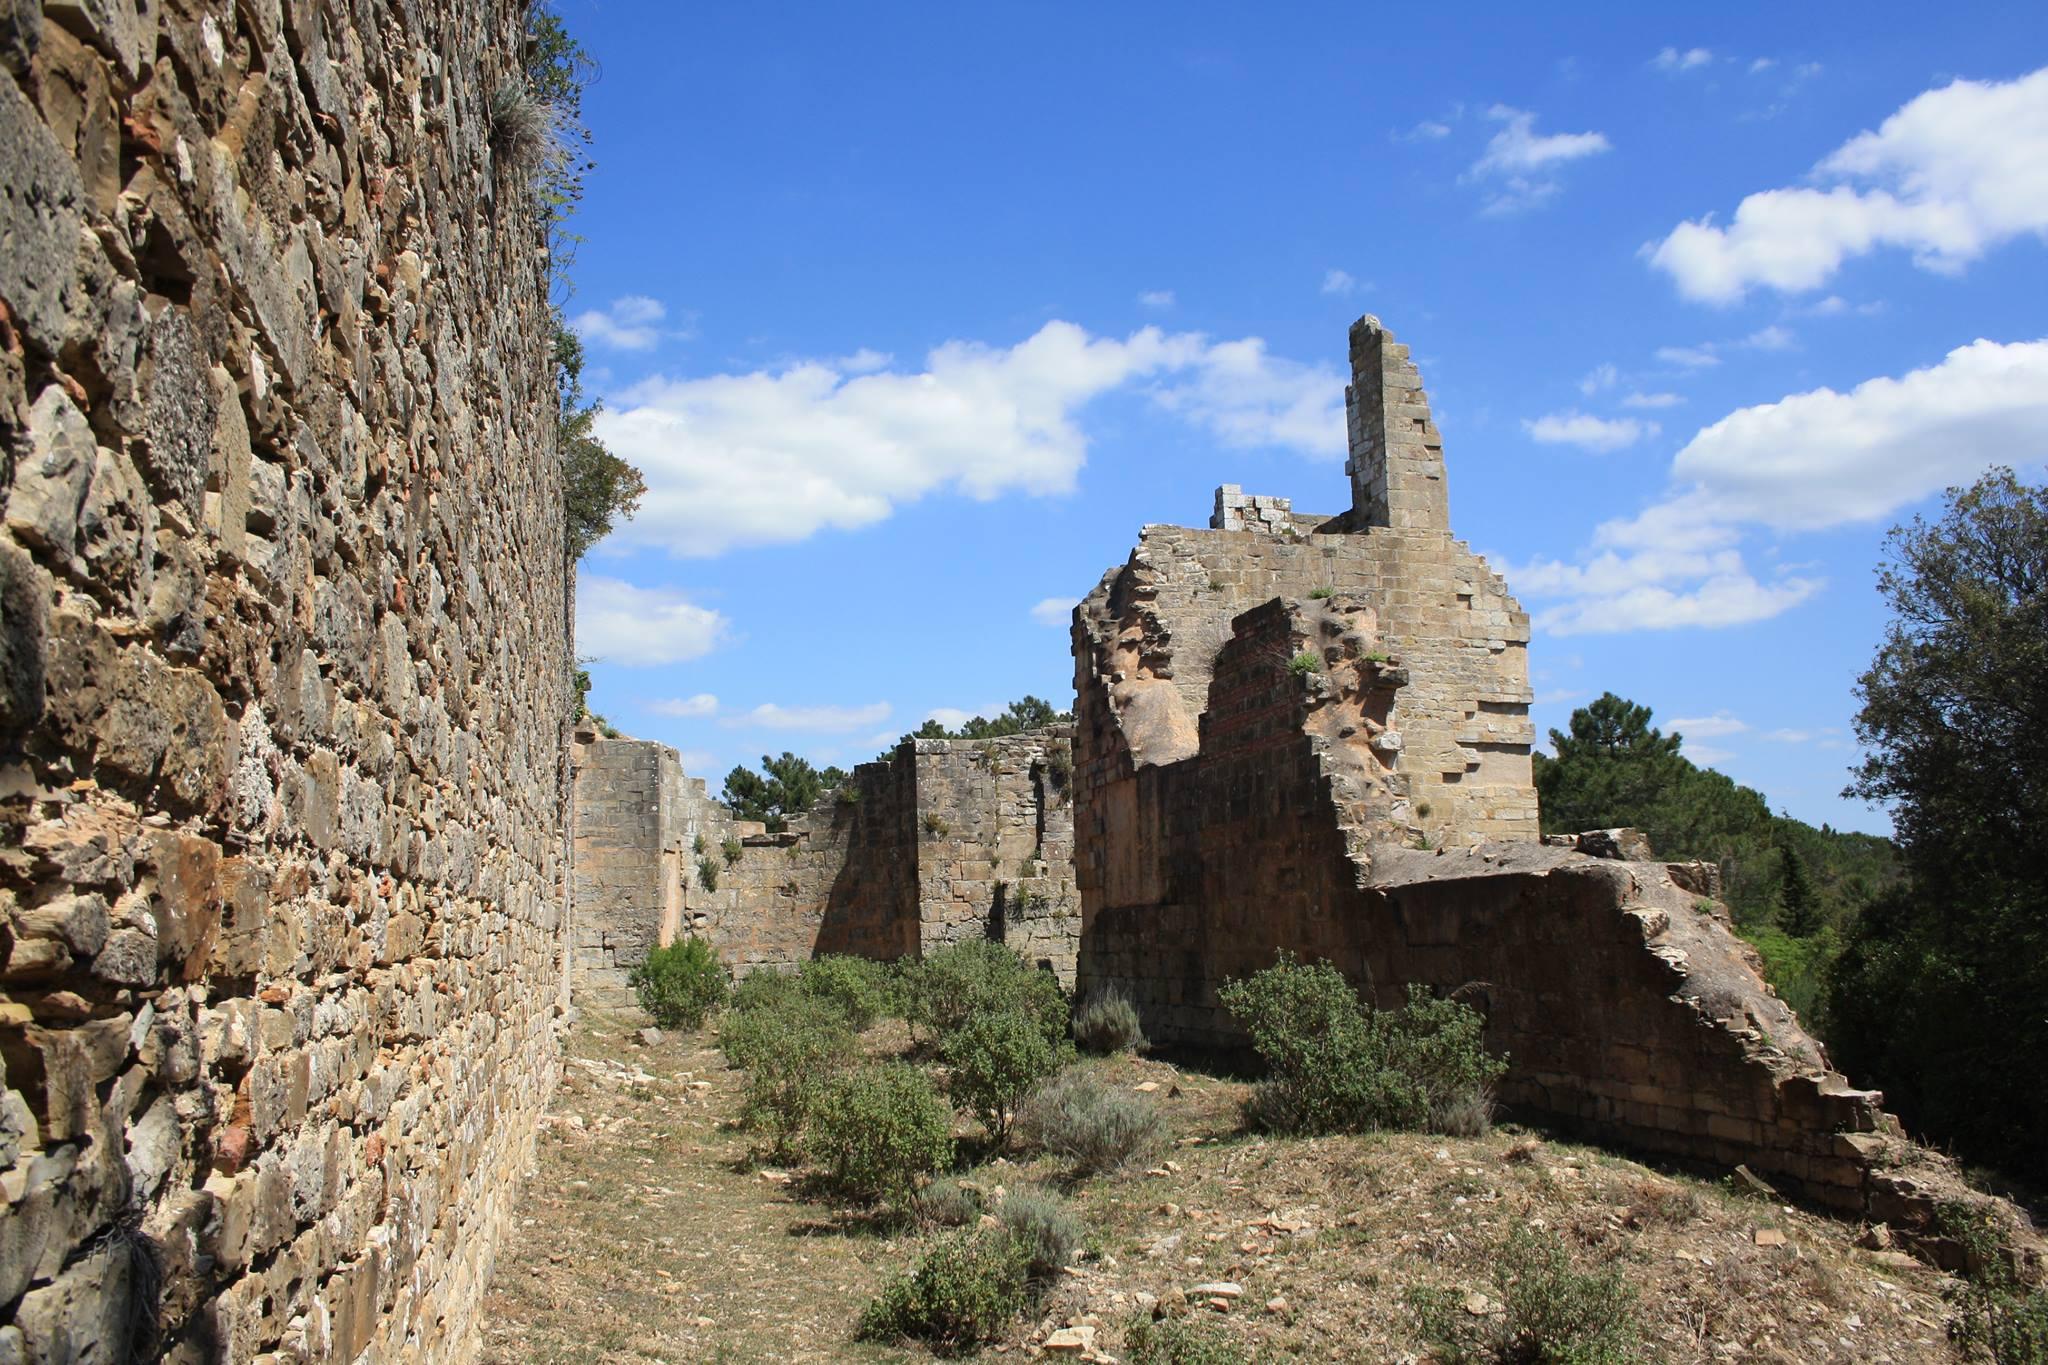 Badia San Pietro in Palazzuolo